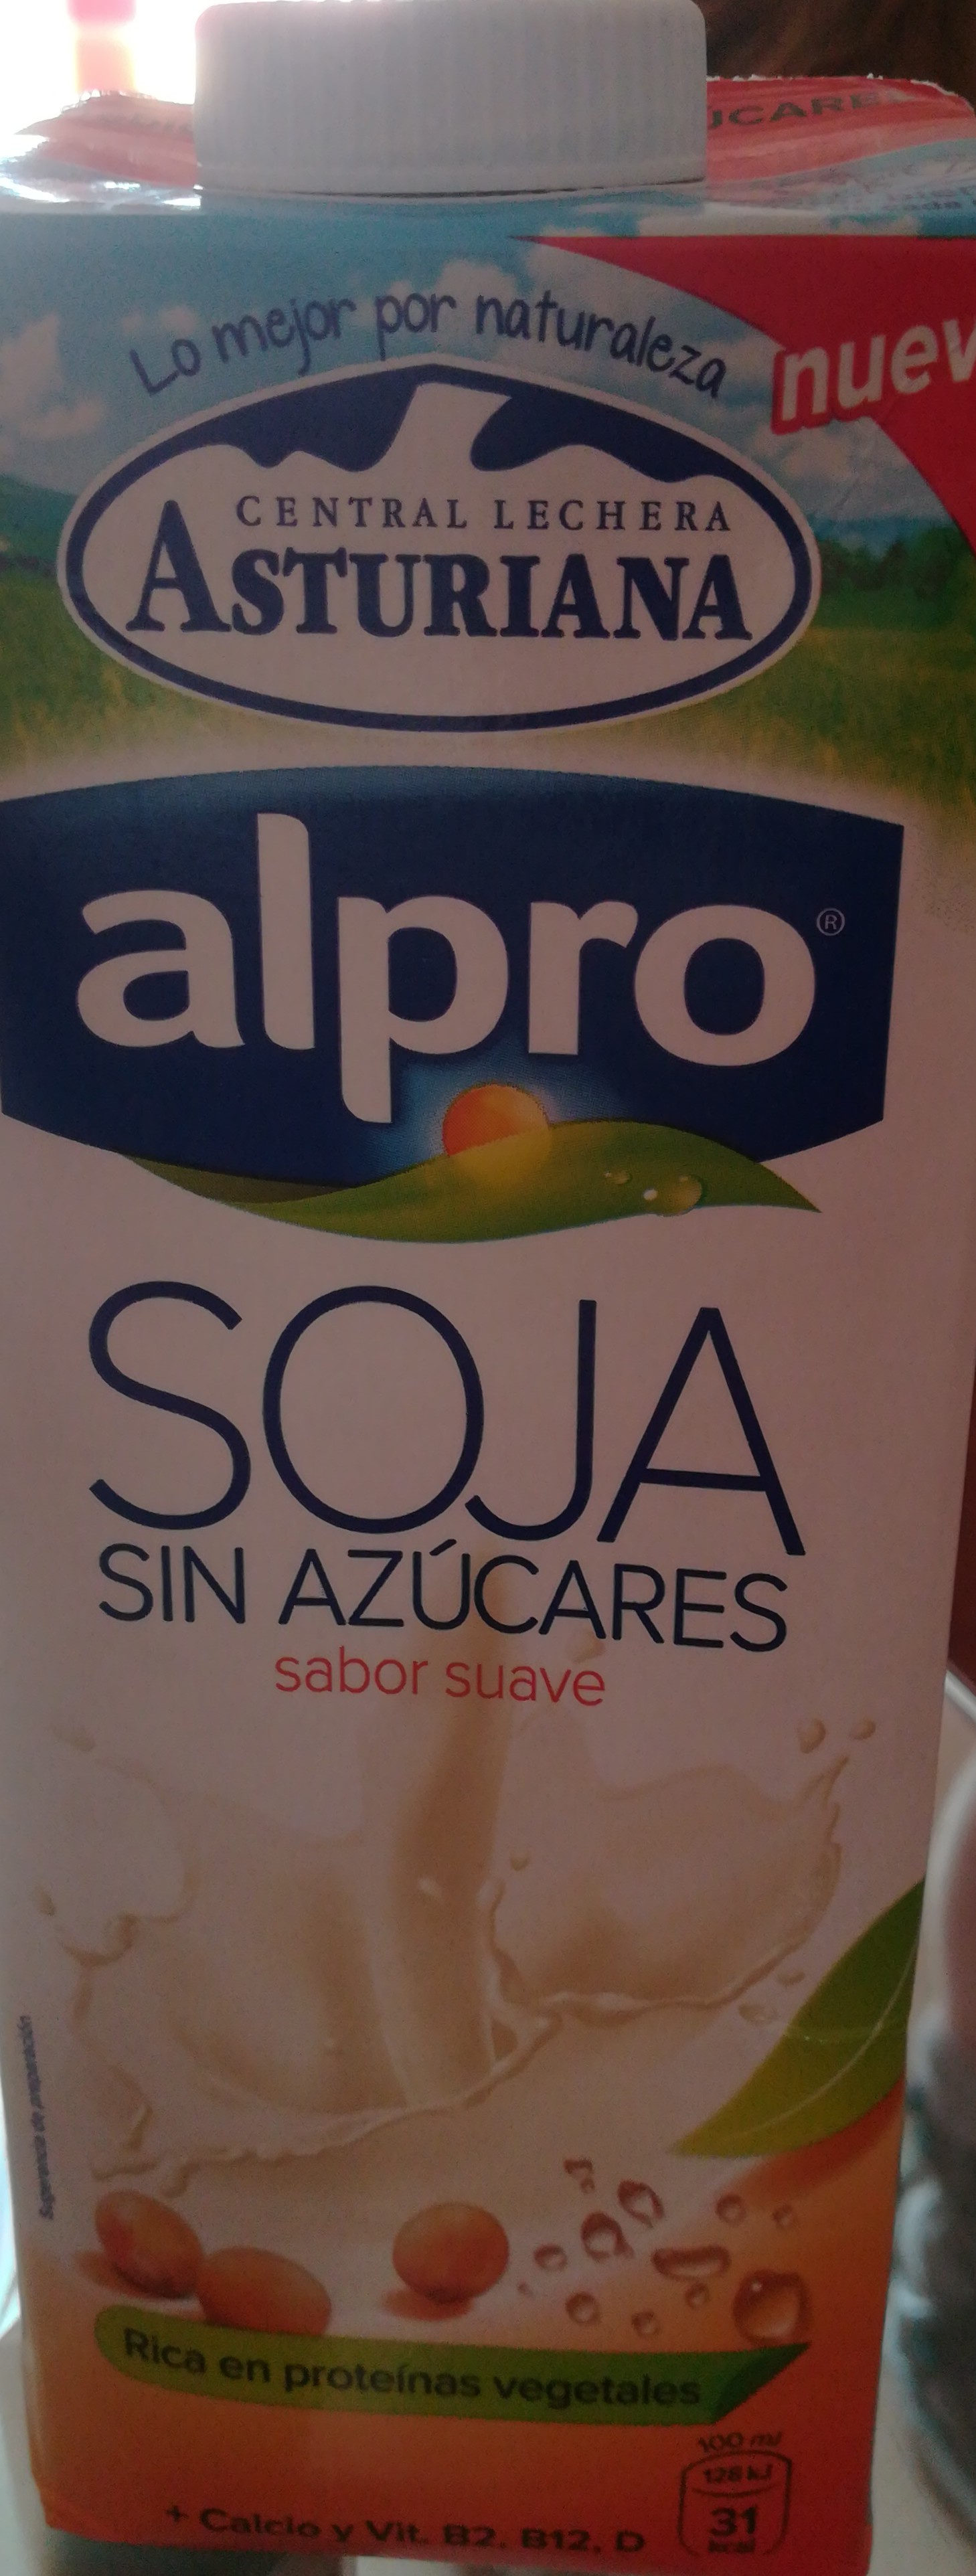 Soja sin azúcar - Producte